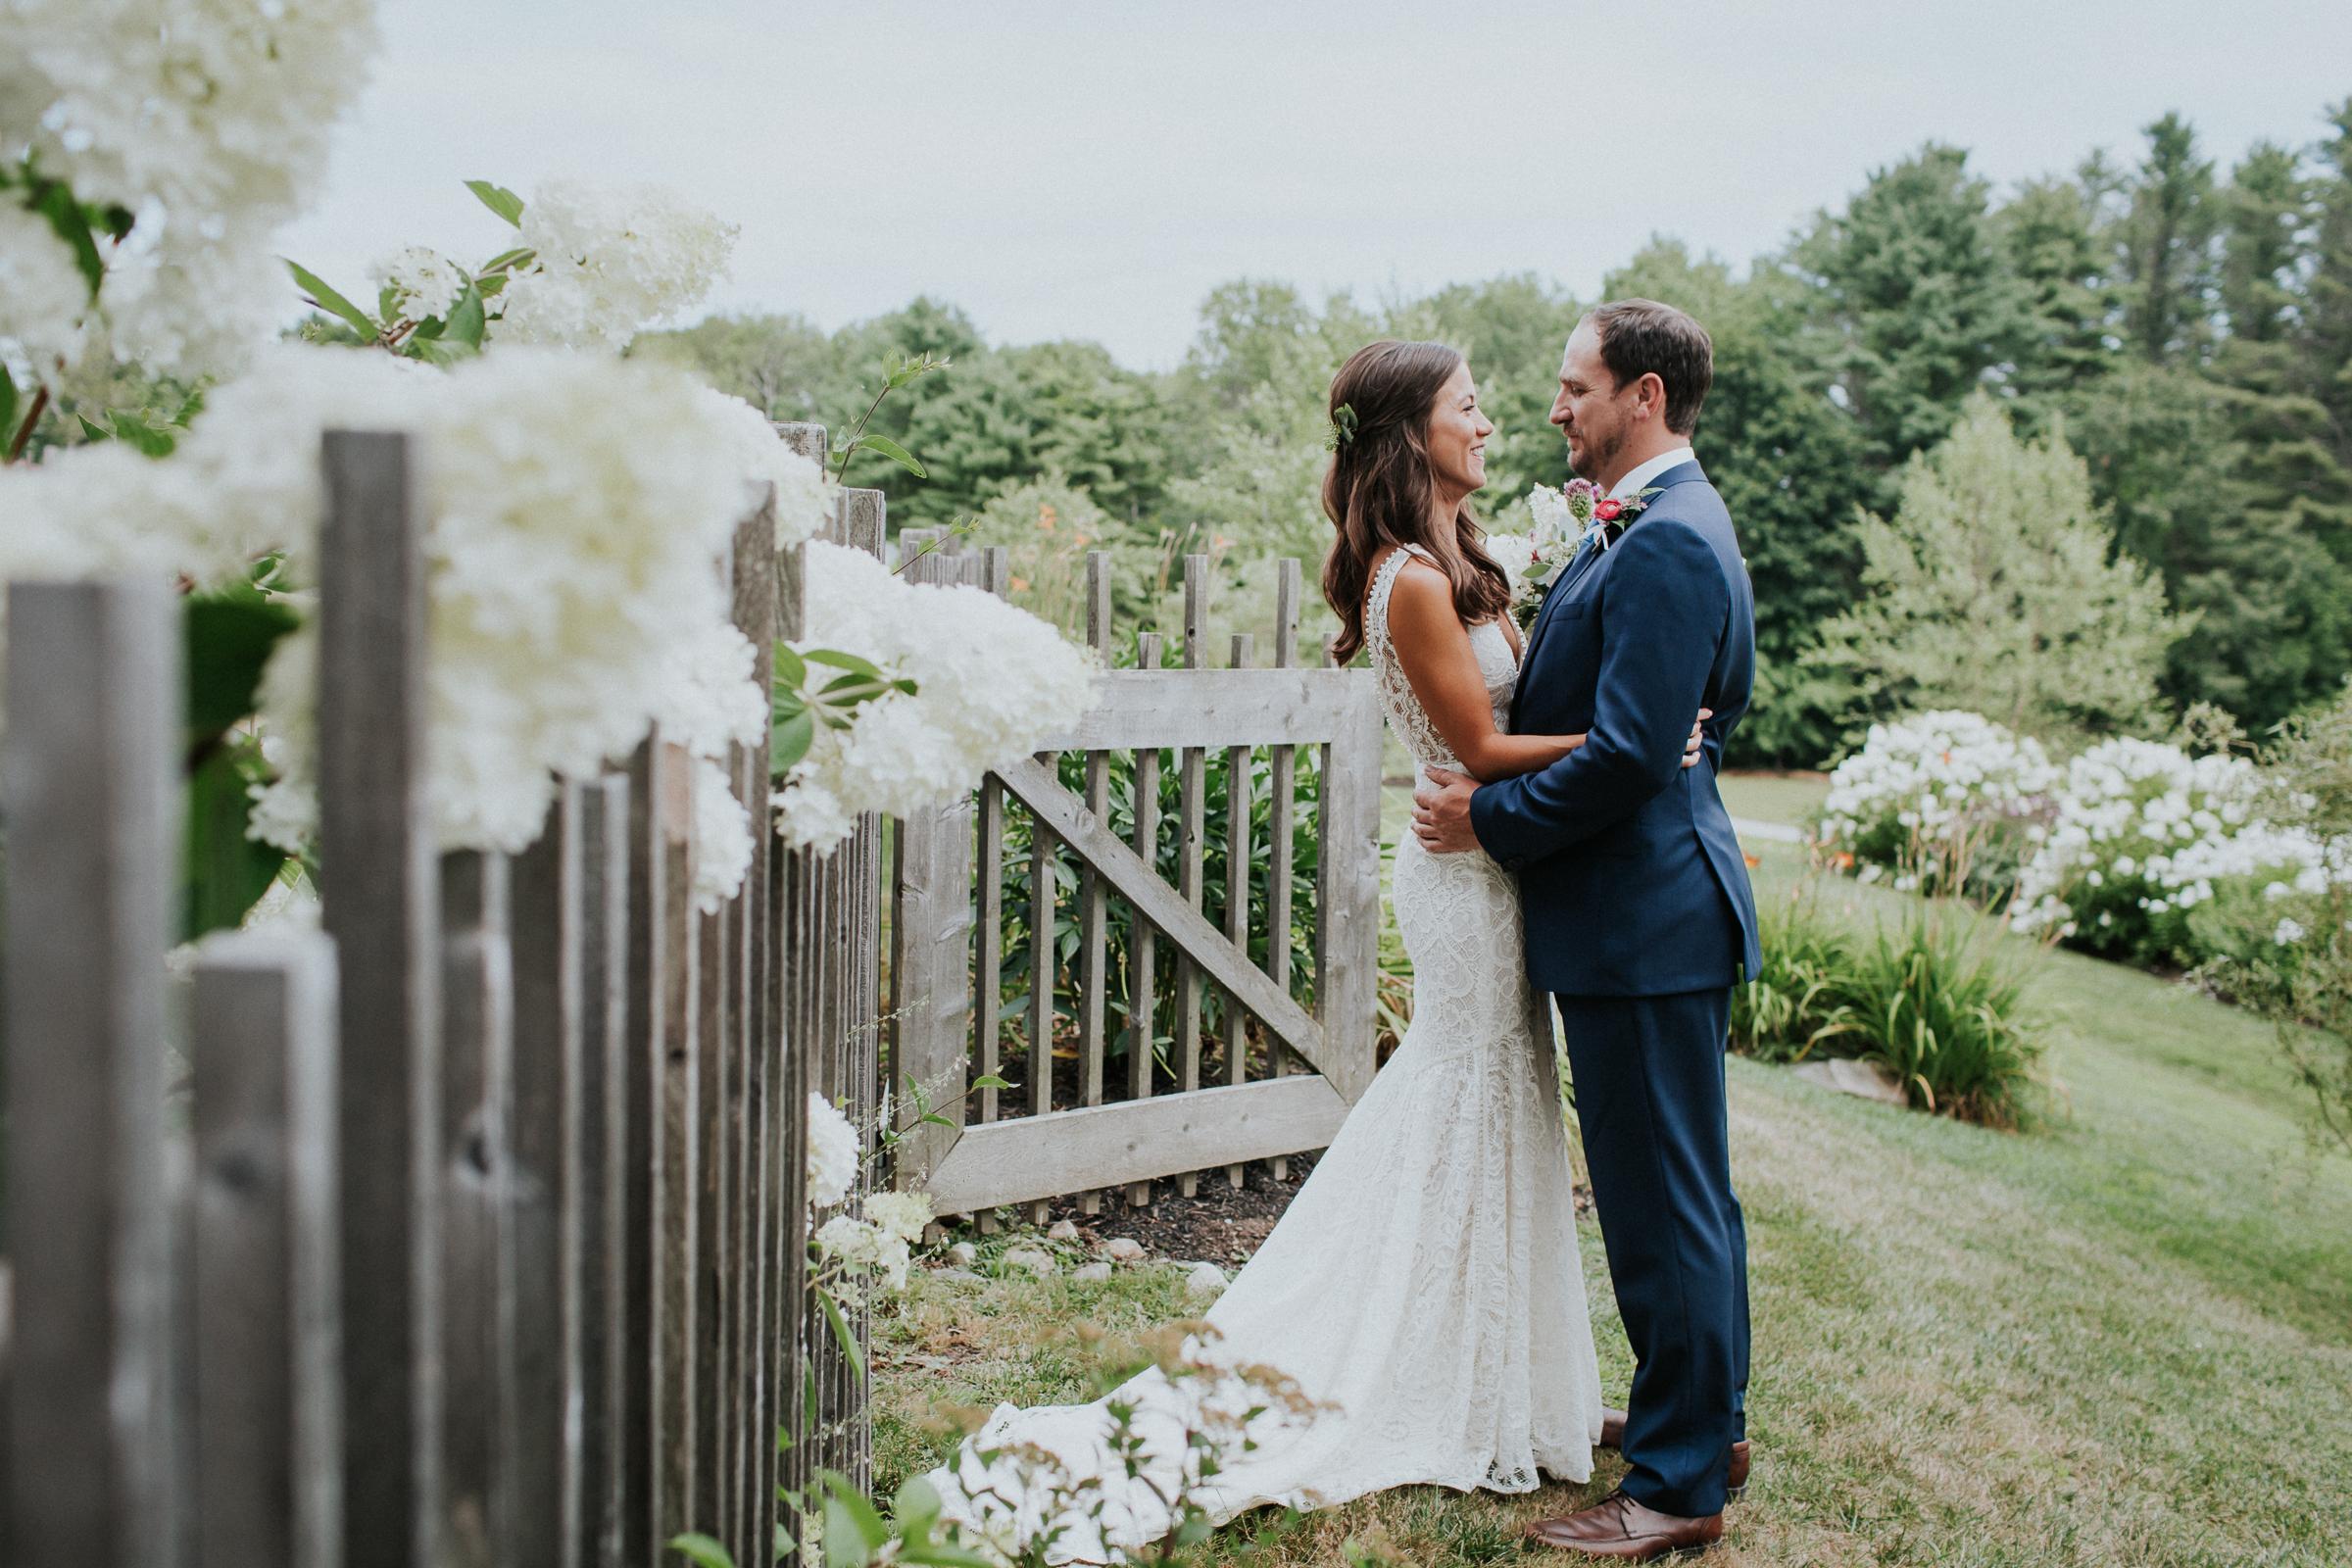 Marianmade-Farm-Wiscasset-Maine-Fine-Art-Documentary-Wedding-Photographer-Elvira-Kalviste-Photography-34.jpg